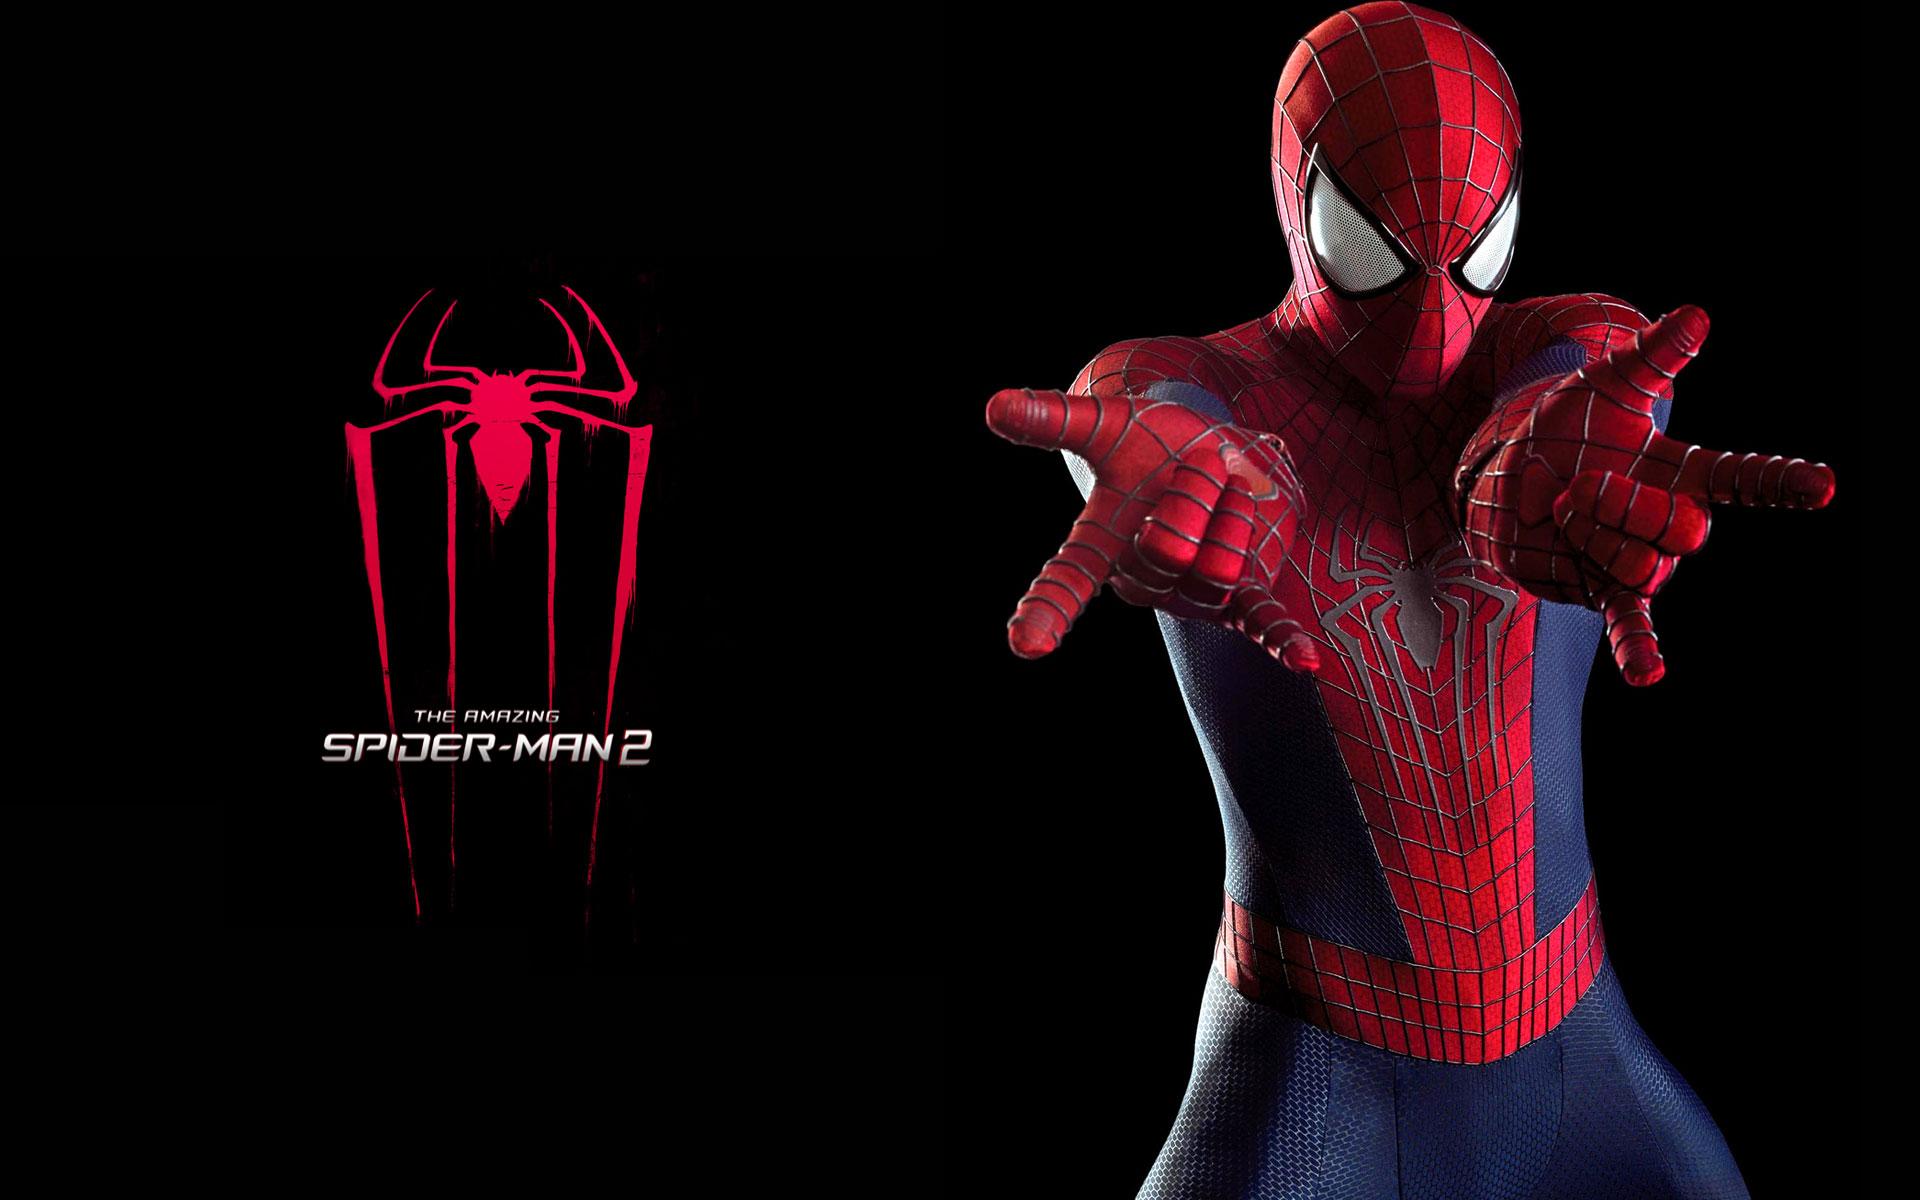 Amazing Spider Man 2 Wallpaper Wallpapersafari